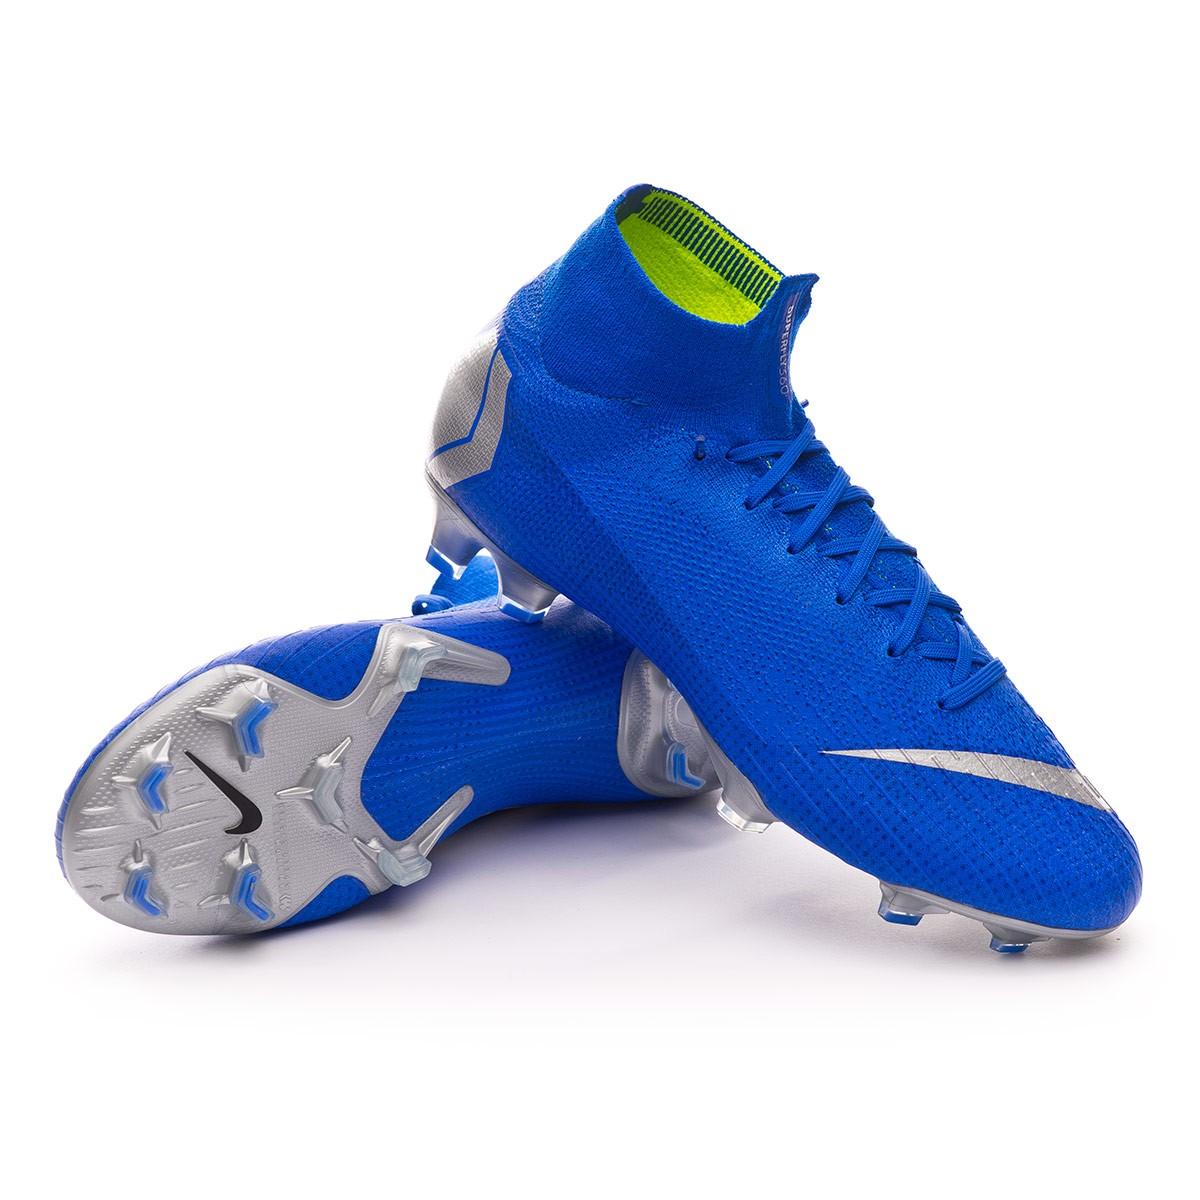 b4c968347 Football Boots Nike Mercurial Superfly VI Elite FG Racer blue-Matallic  silver-Black - Football store Fútbol Emotion